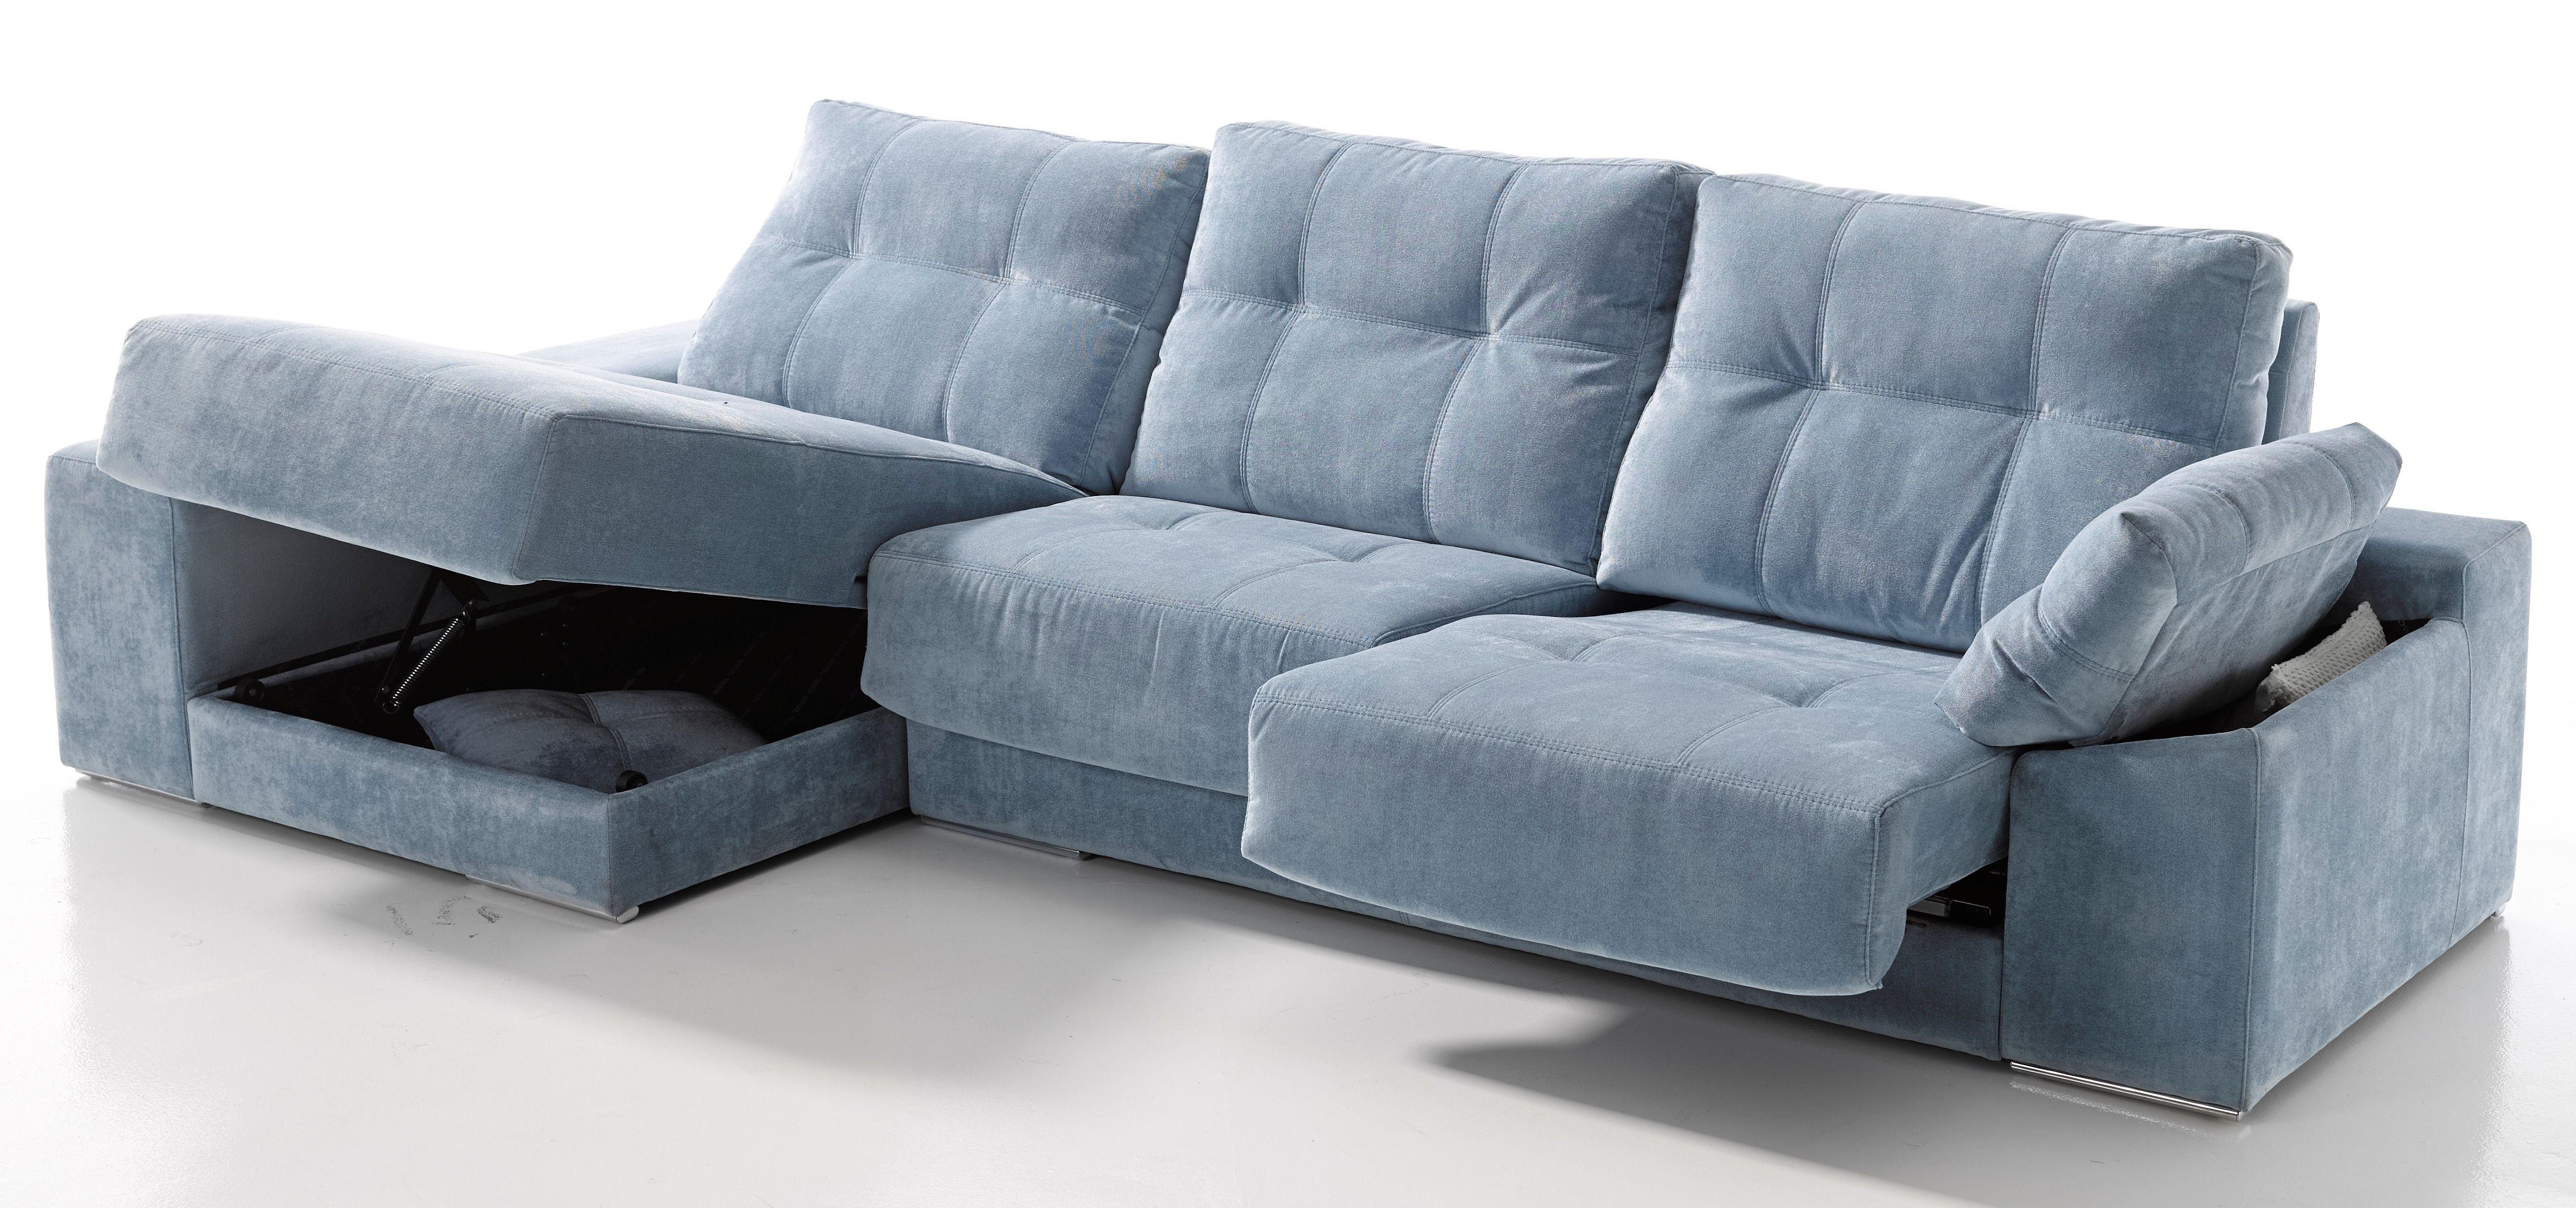 Sofá 3 Plazas 298 Cm Asientos Deslizantes Con Arcón Respaldos Deslizantes Brazo Con Arcón Modul Living Room Sofa Design Vintage Style Sofas Sofa Set Designs